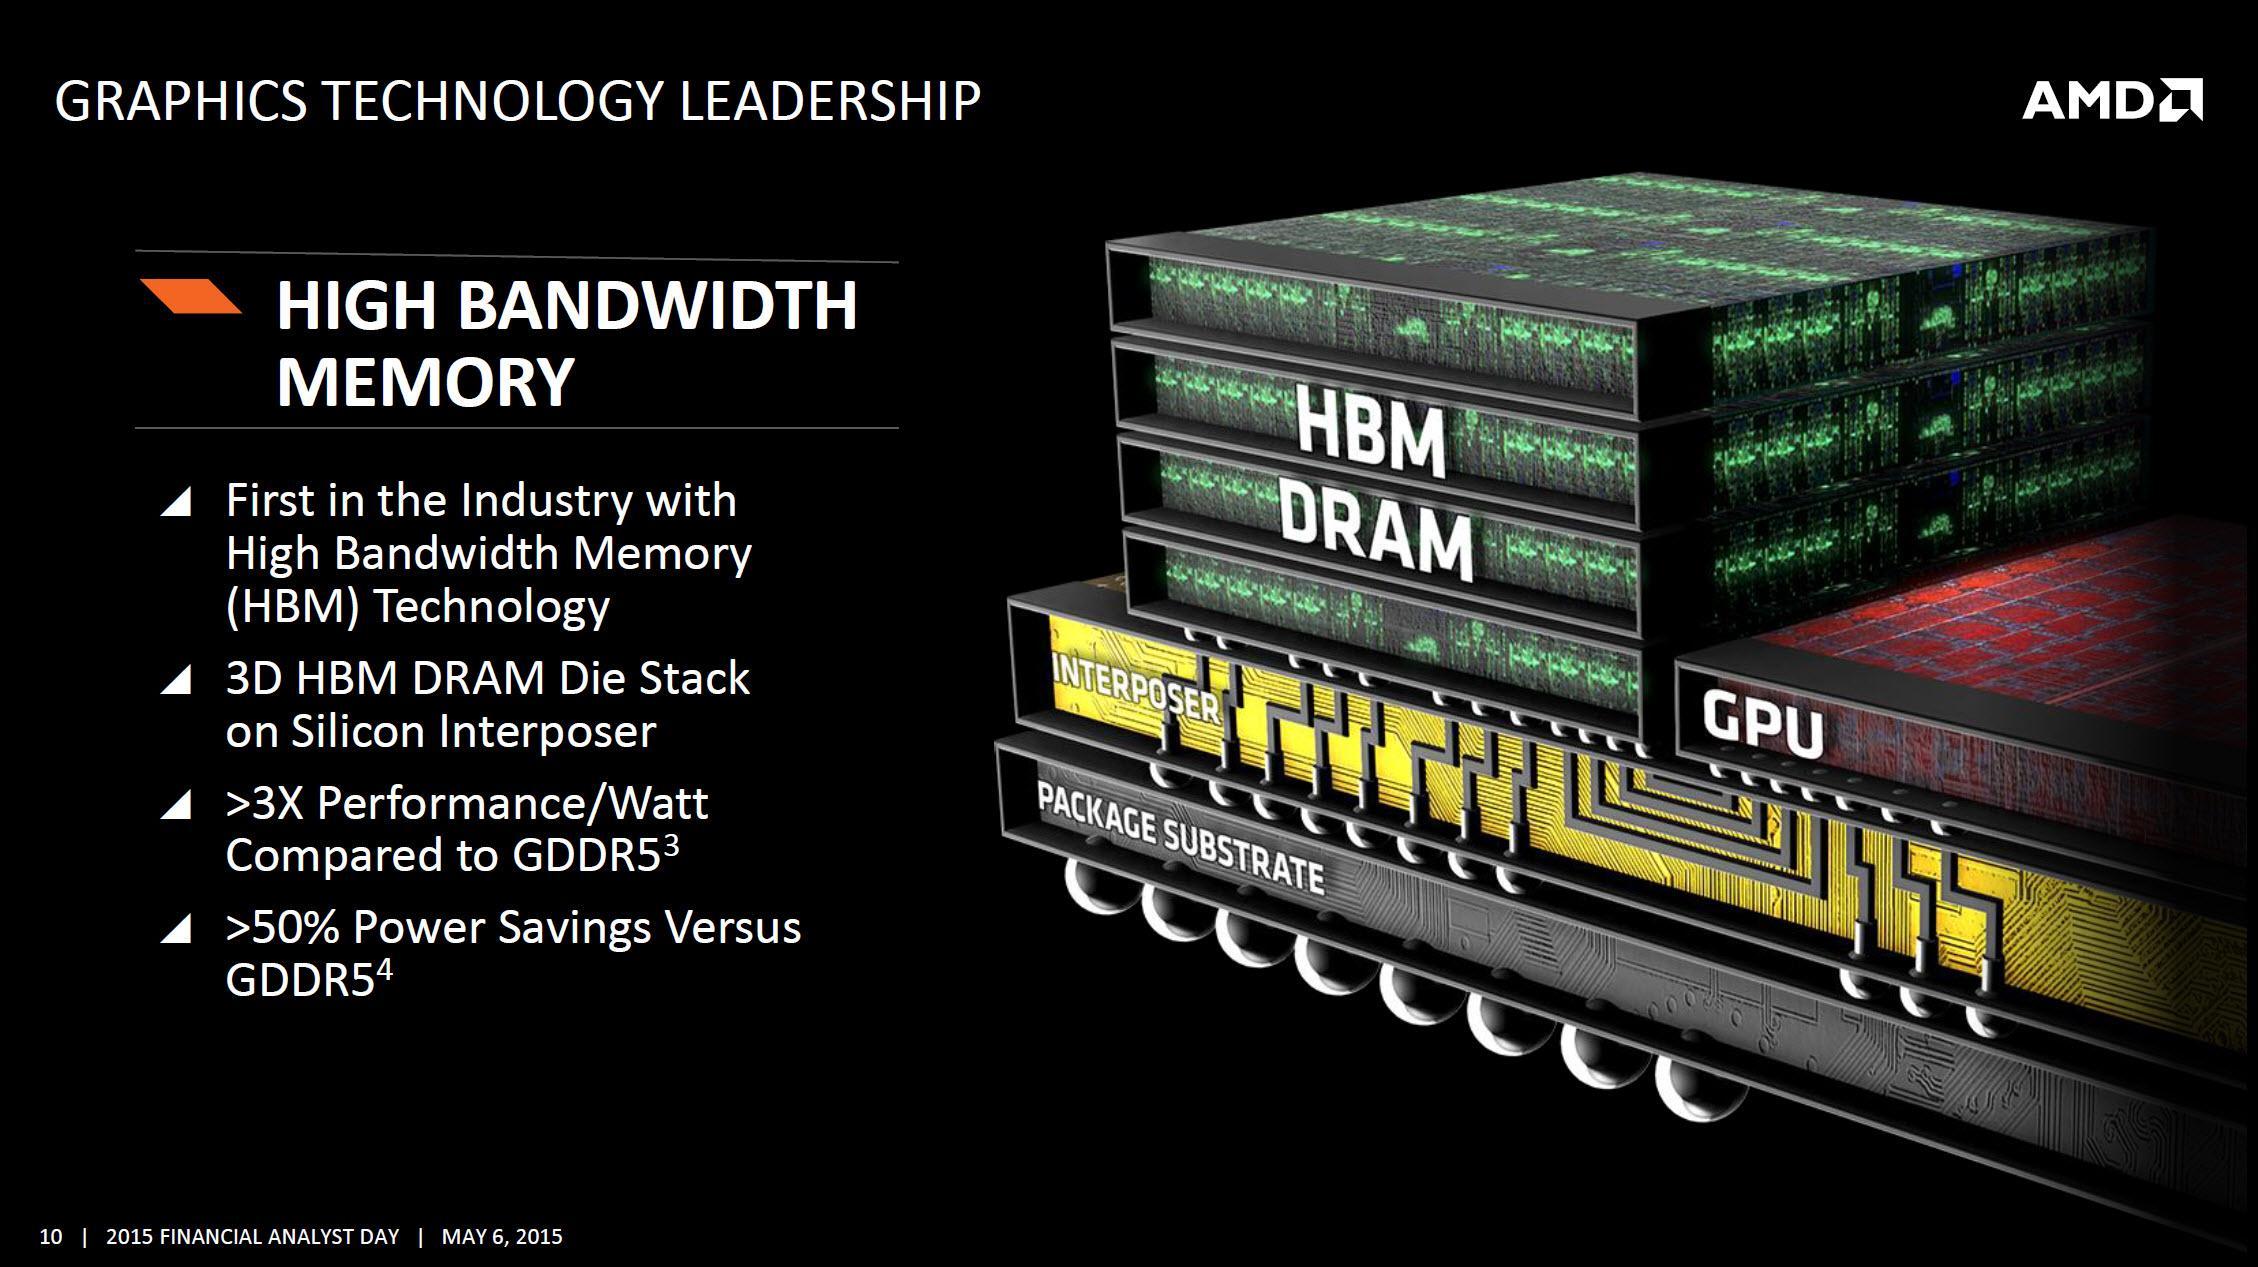 AMD-GCN-HBM-High-Bandwidth-Memory